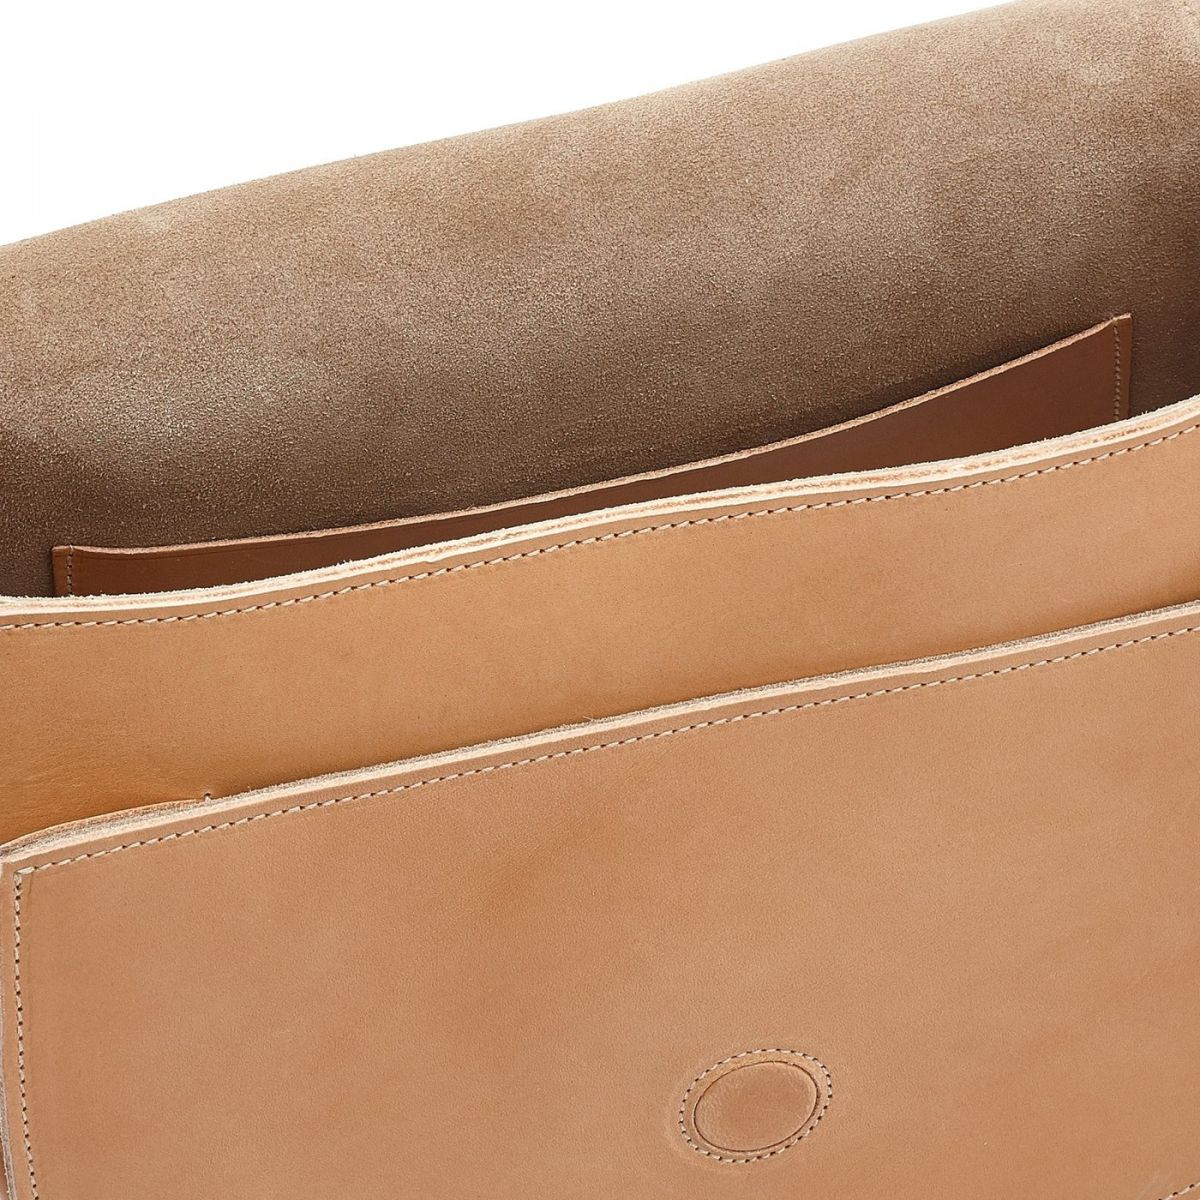 Women's Crossbody Bag in Cowhide Leather color Natural - Loop line BCR143 | Details